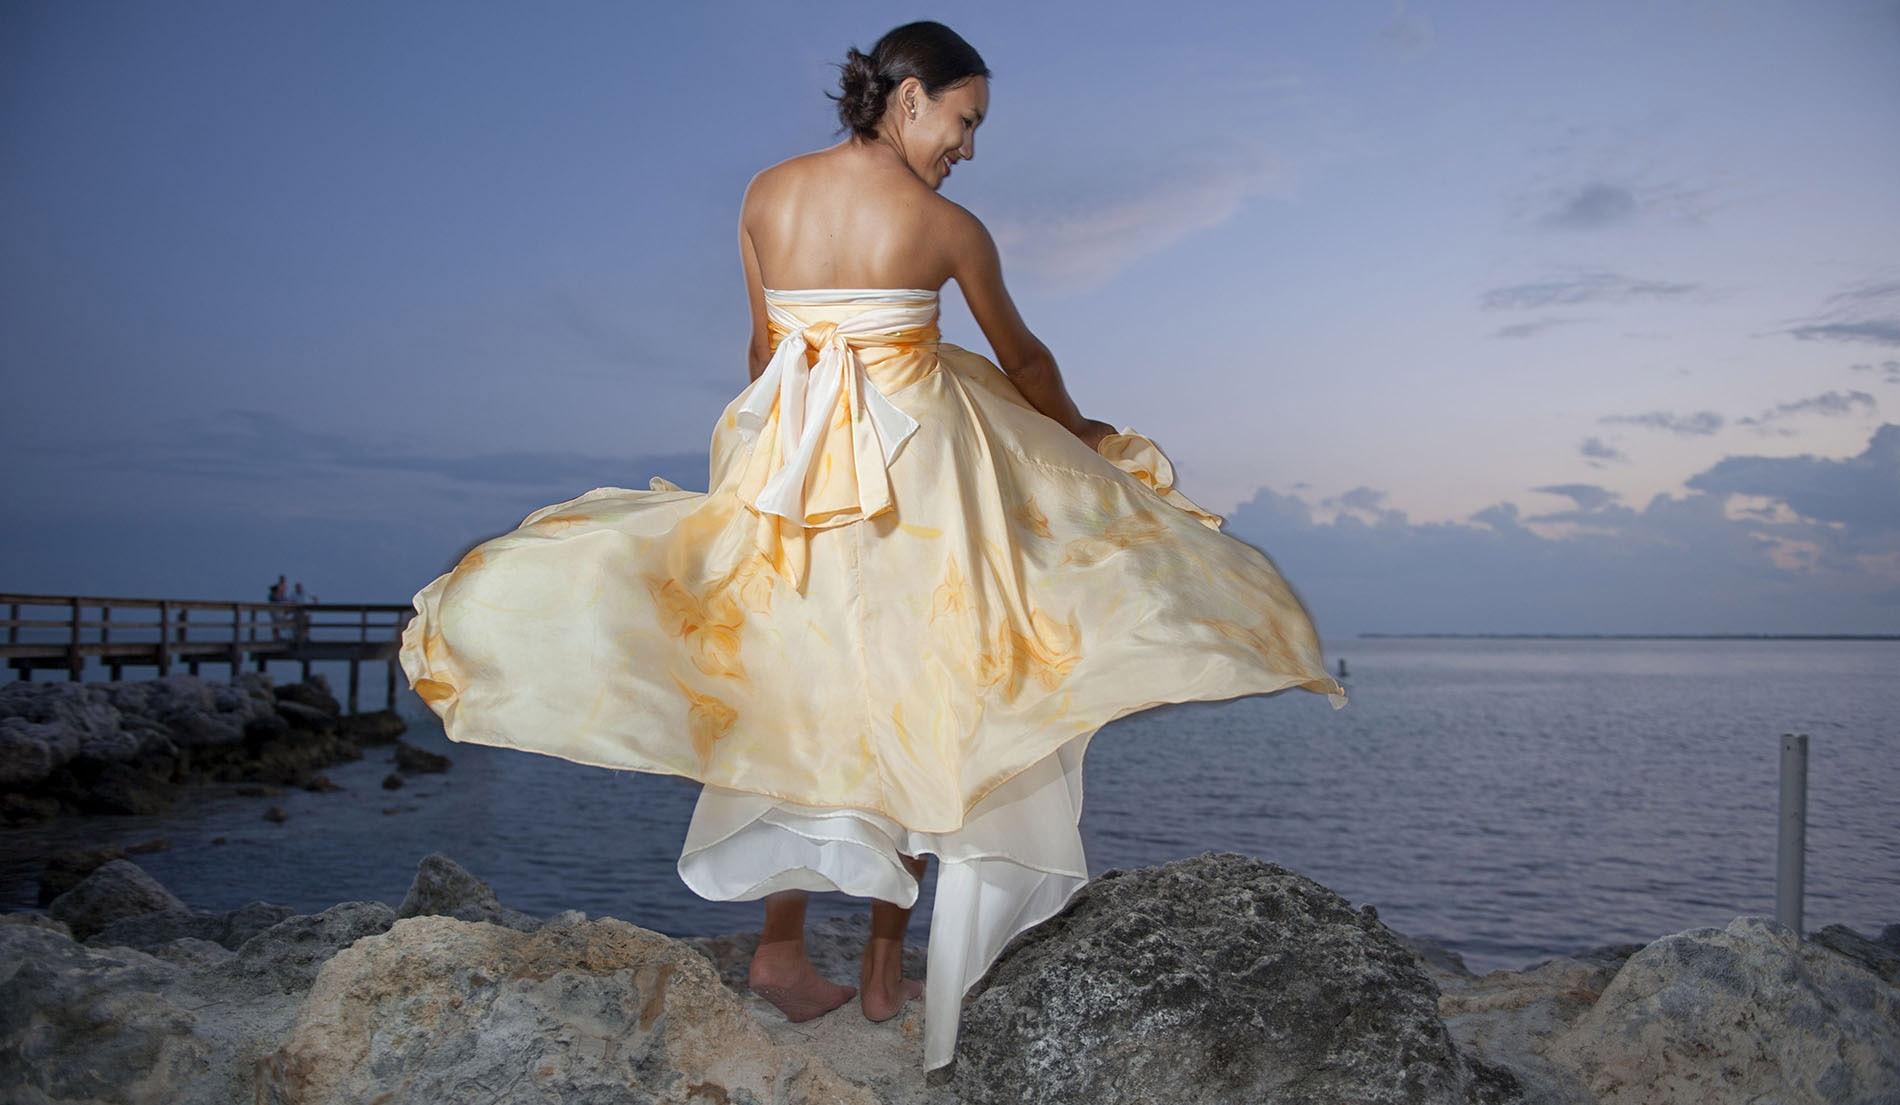 Strapless Bustier Inspired Wedding Dresses - Look 4 back